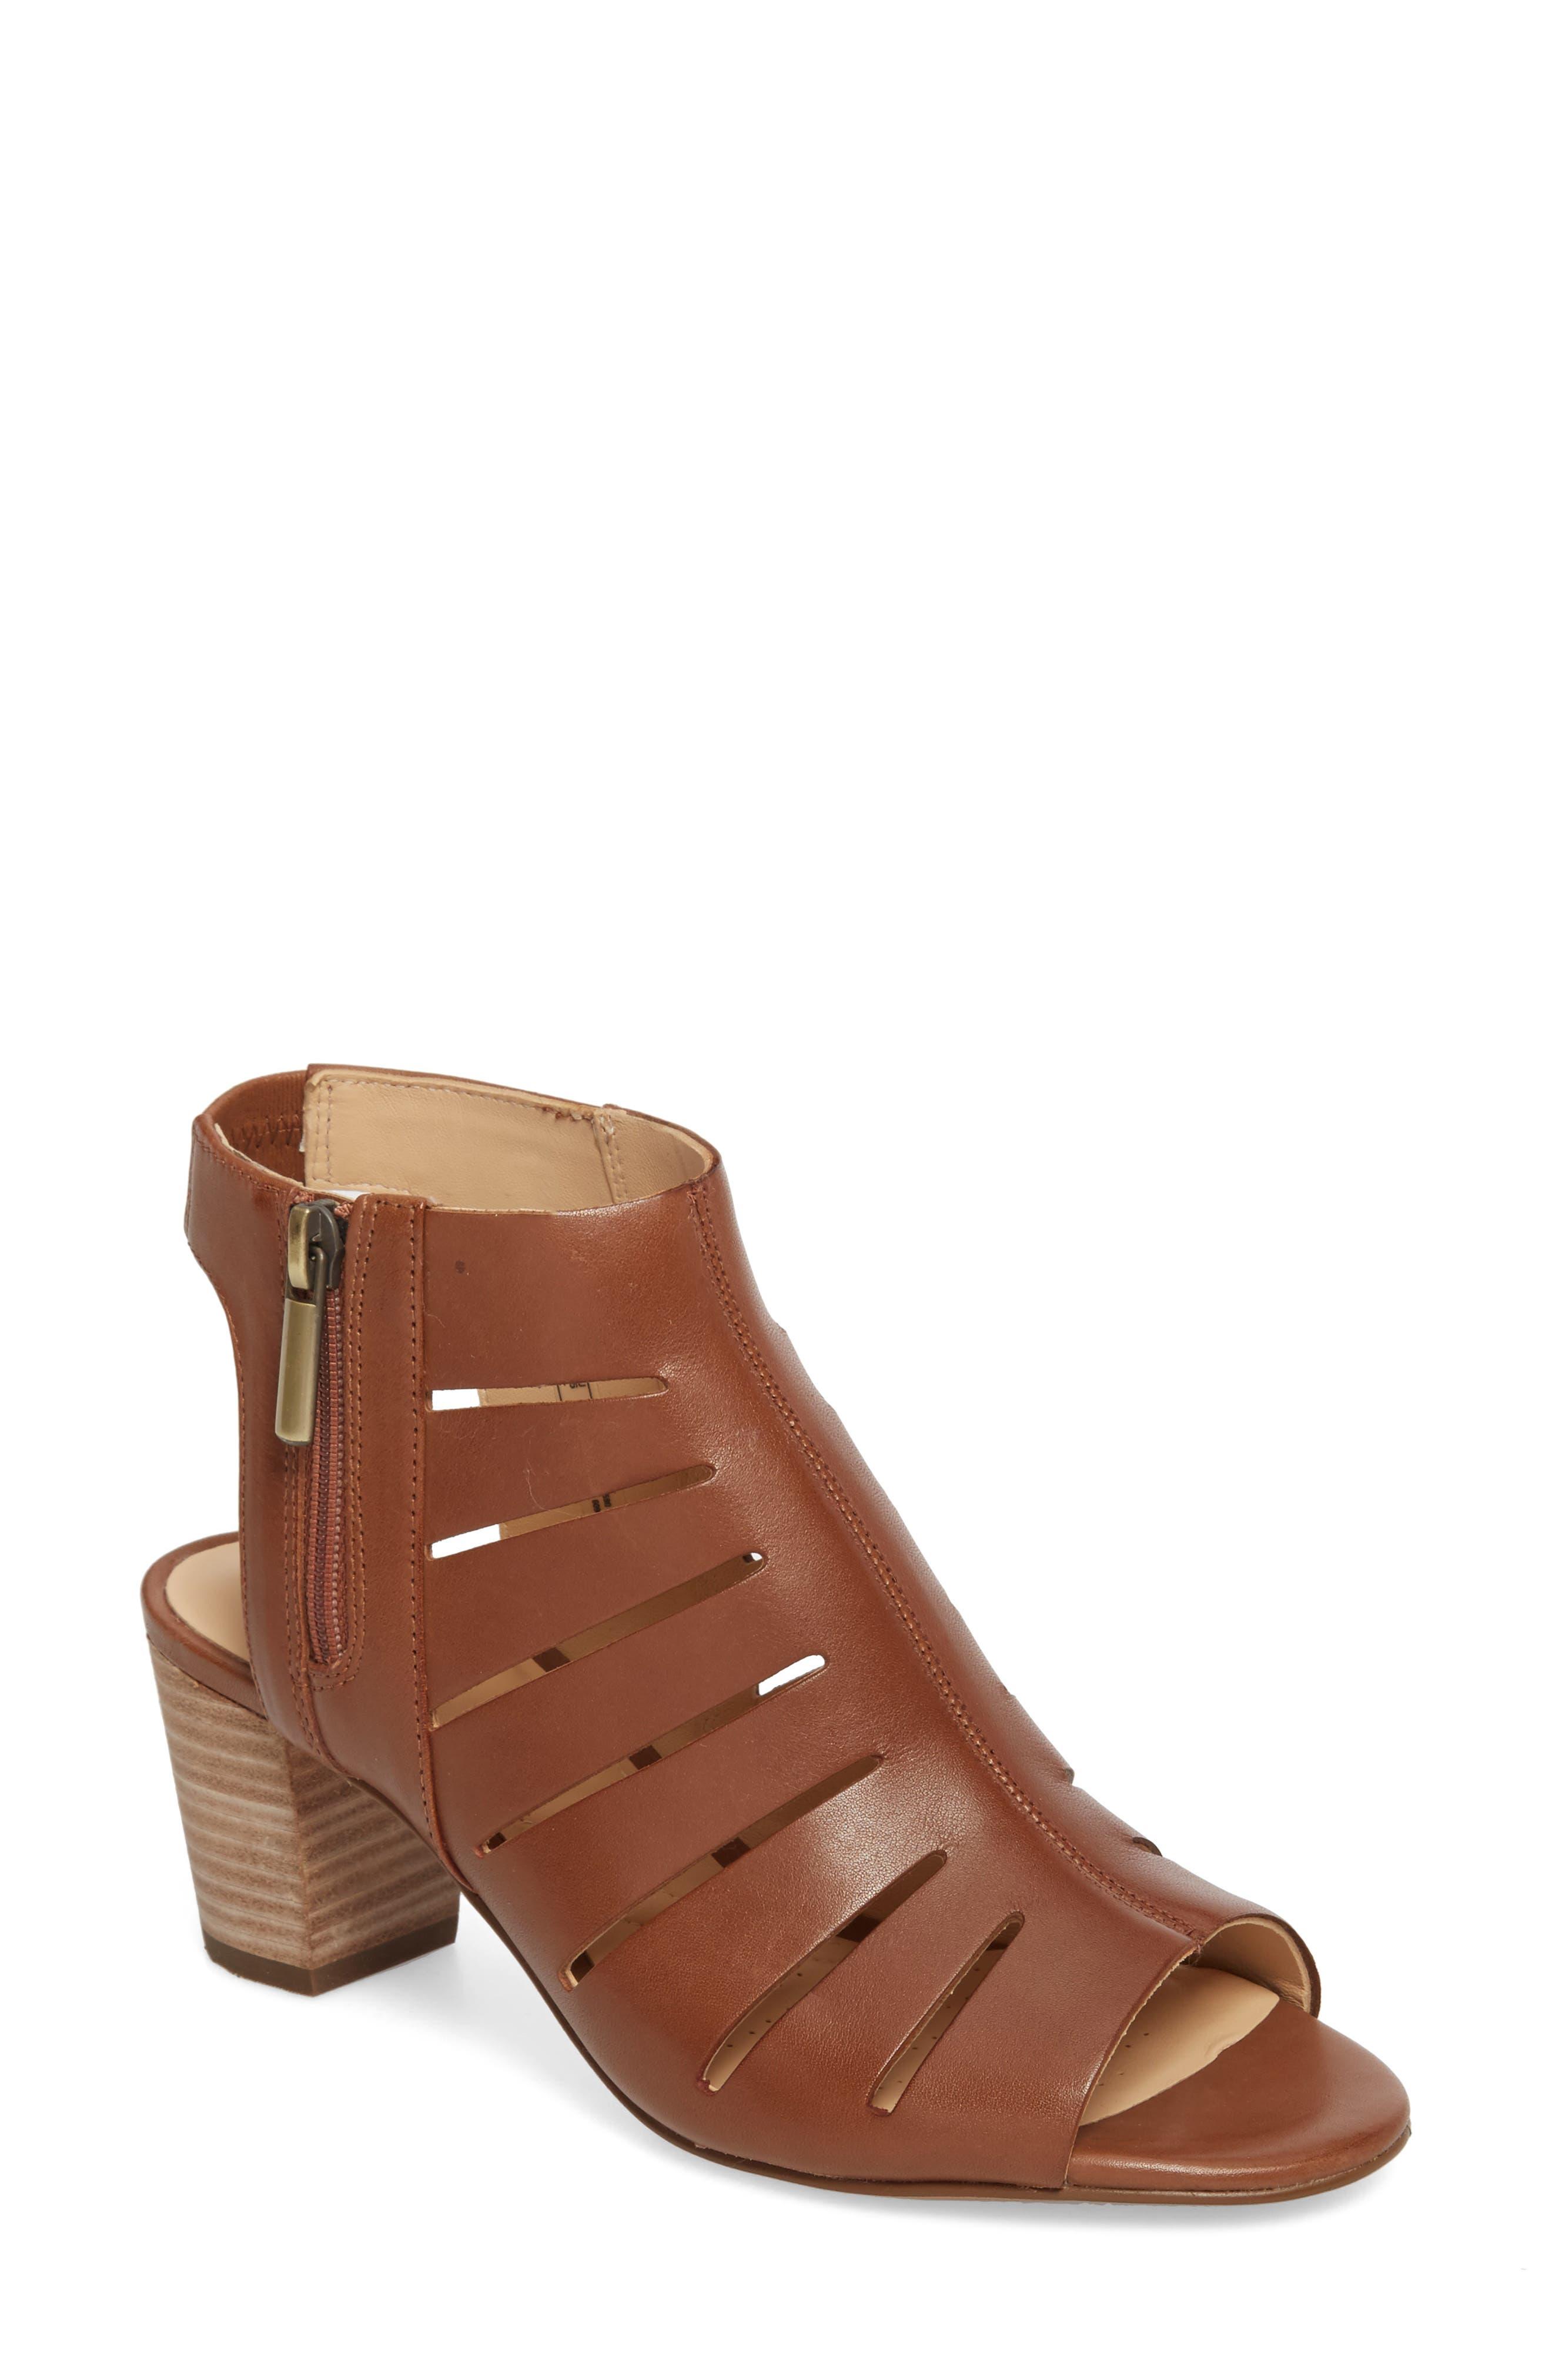 Deloria Ivy Sandal,                         Main,                         color, Tan Leather